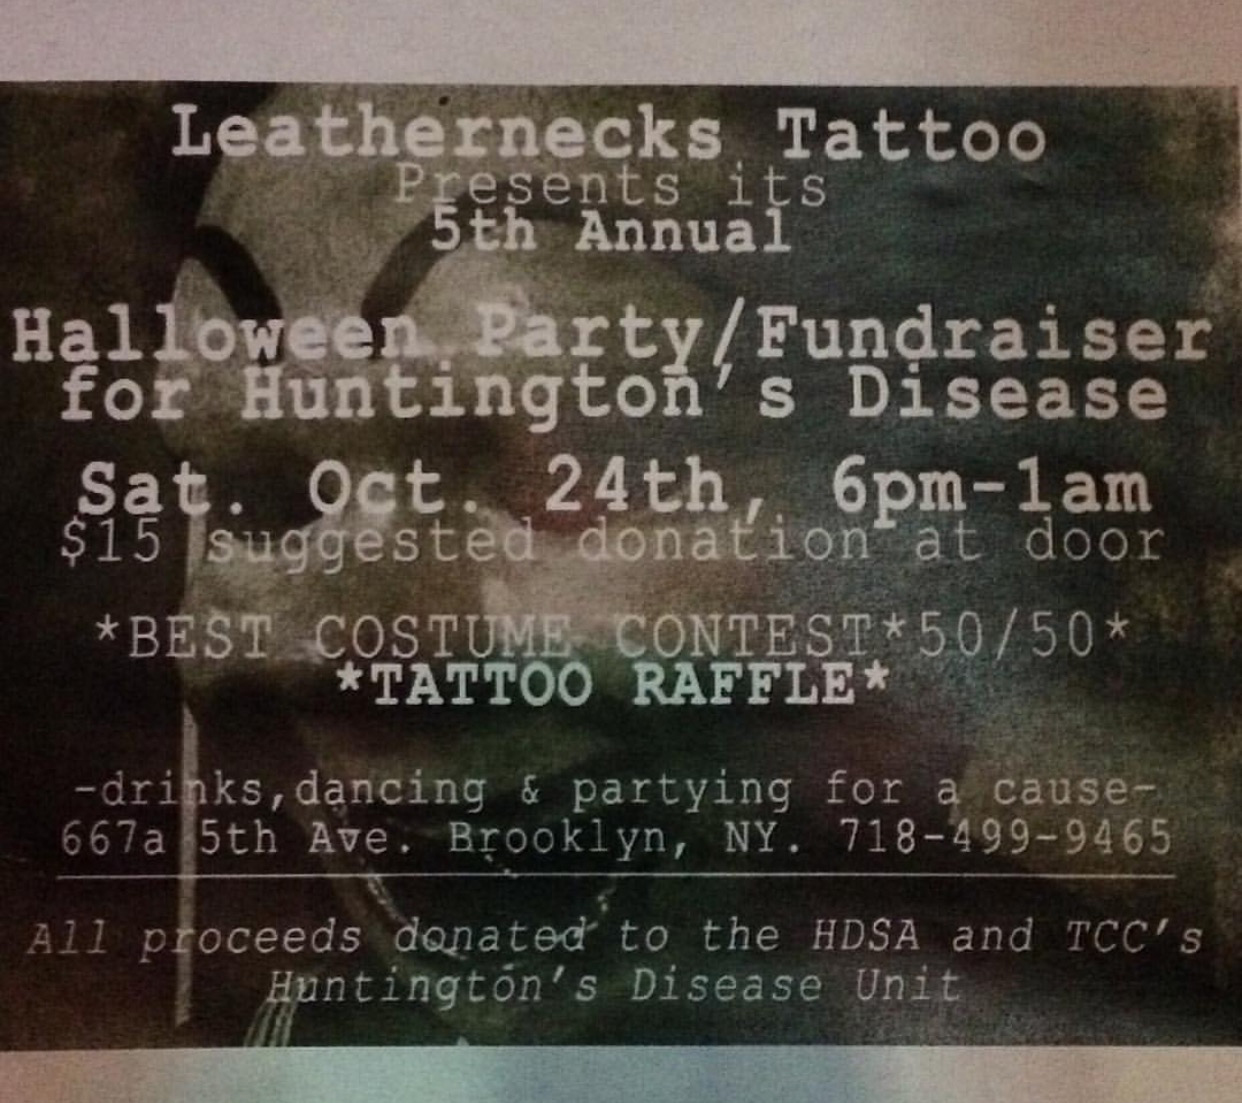 Leathernecks Tattoo Halloween Party 2020 LEATHERNECKS TATTOO